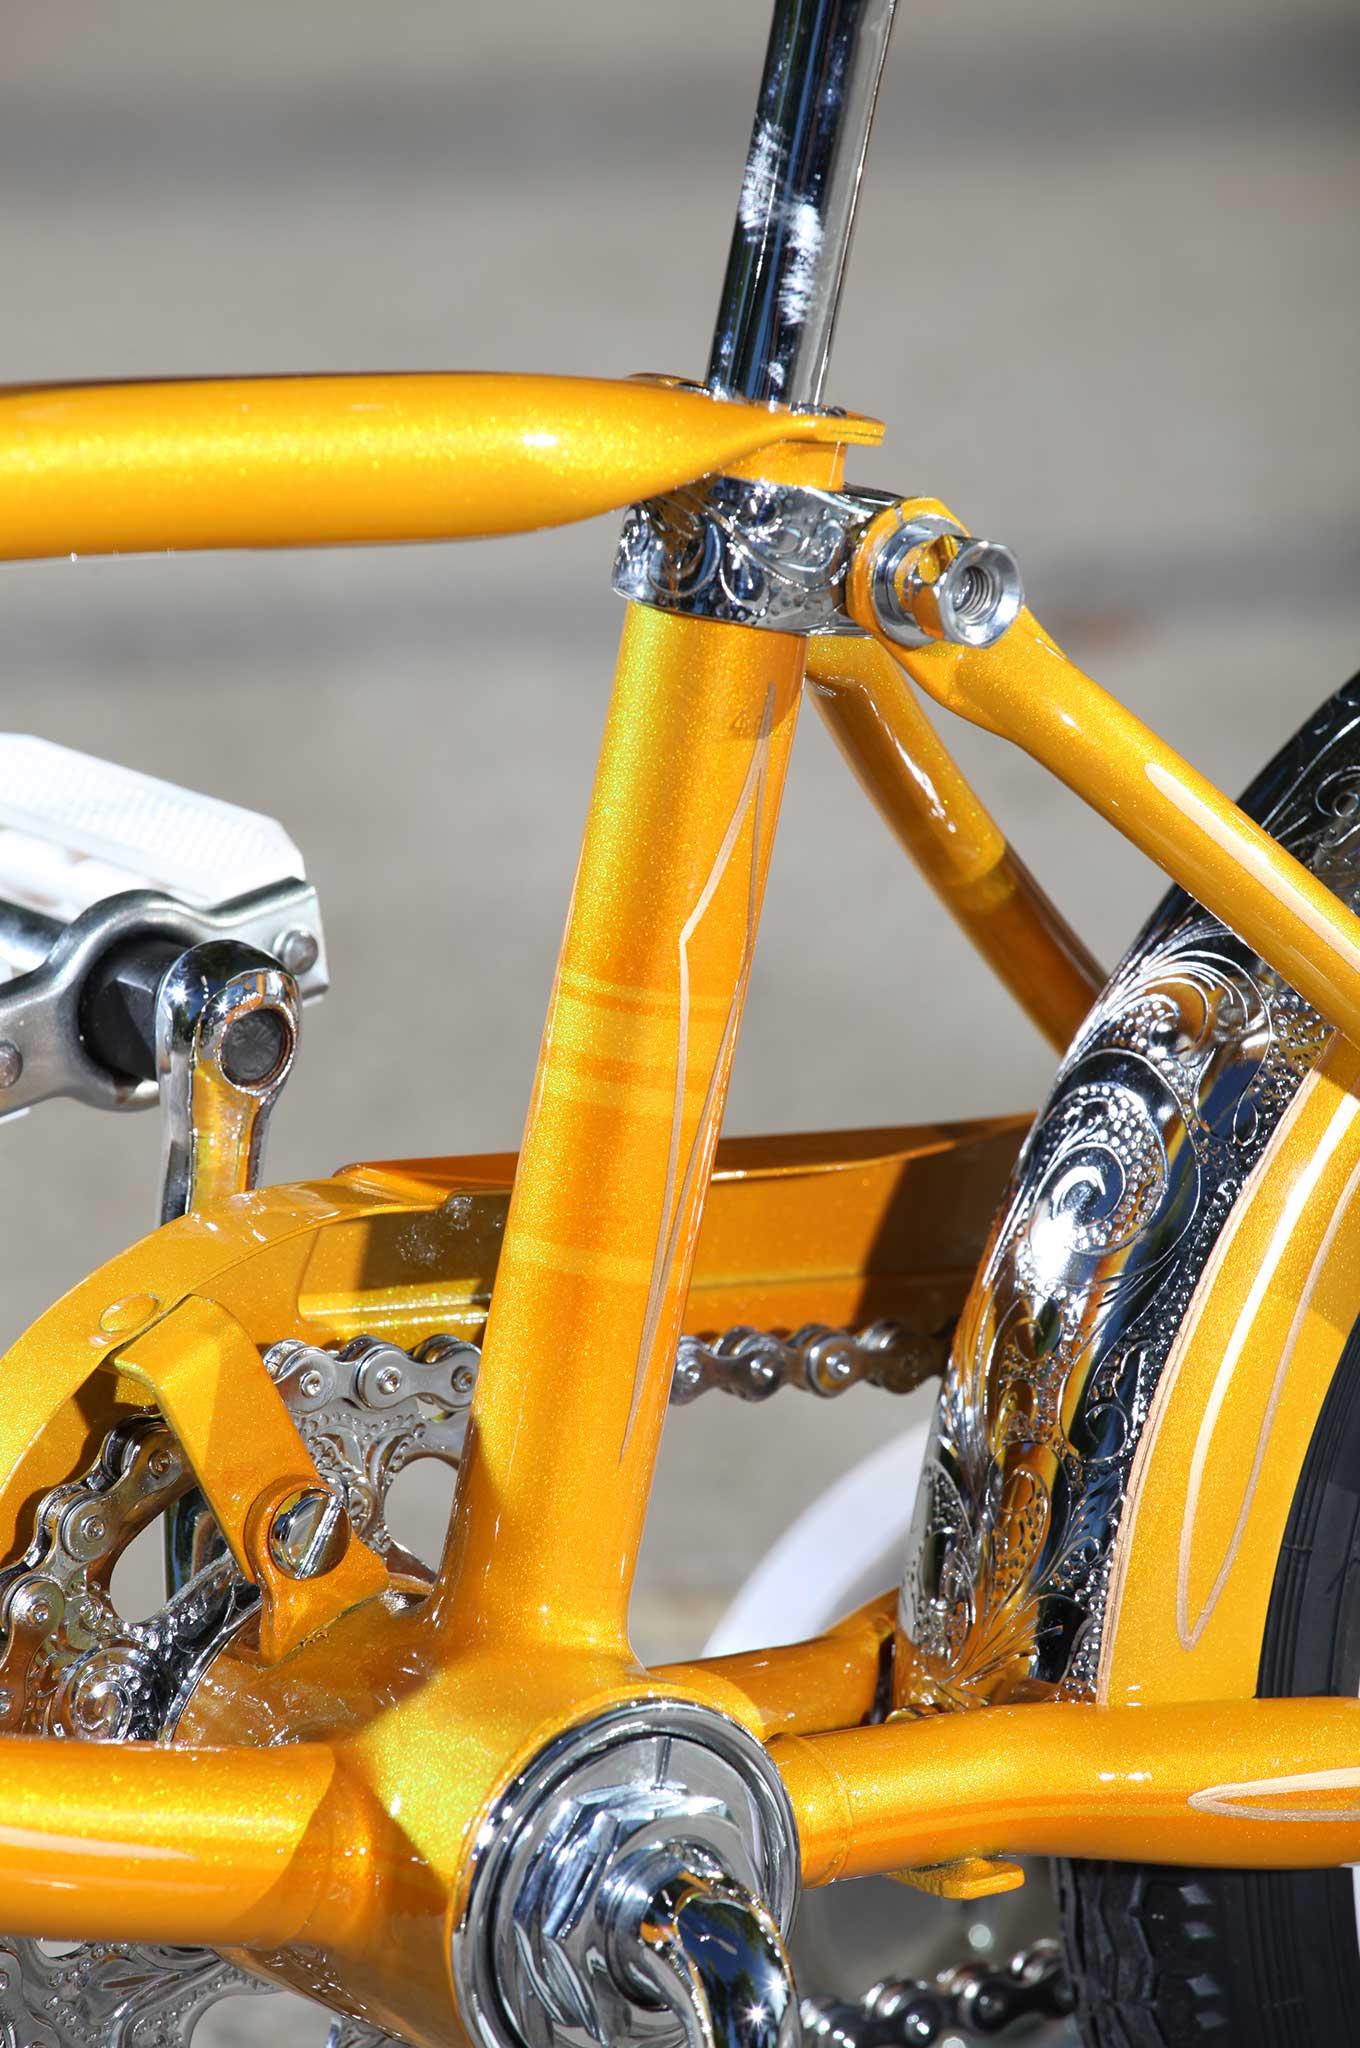 1970s Schwinn Bicycle Lowrider